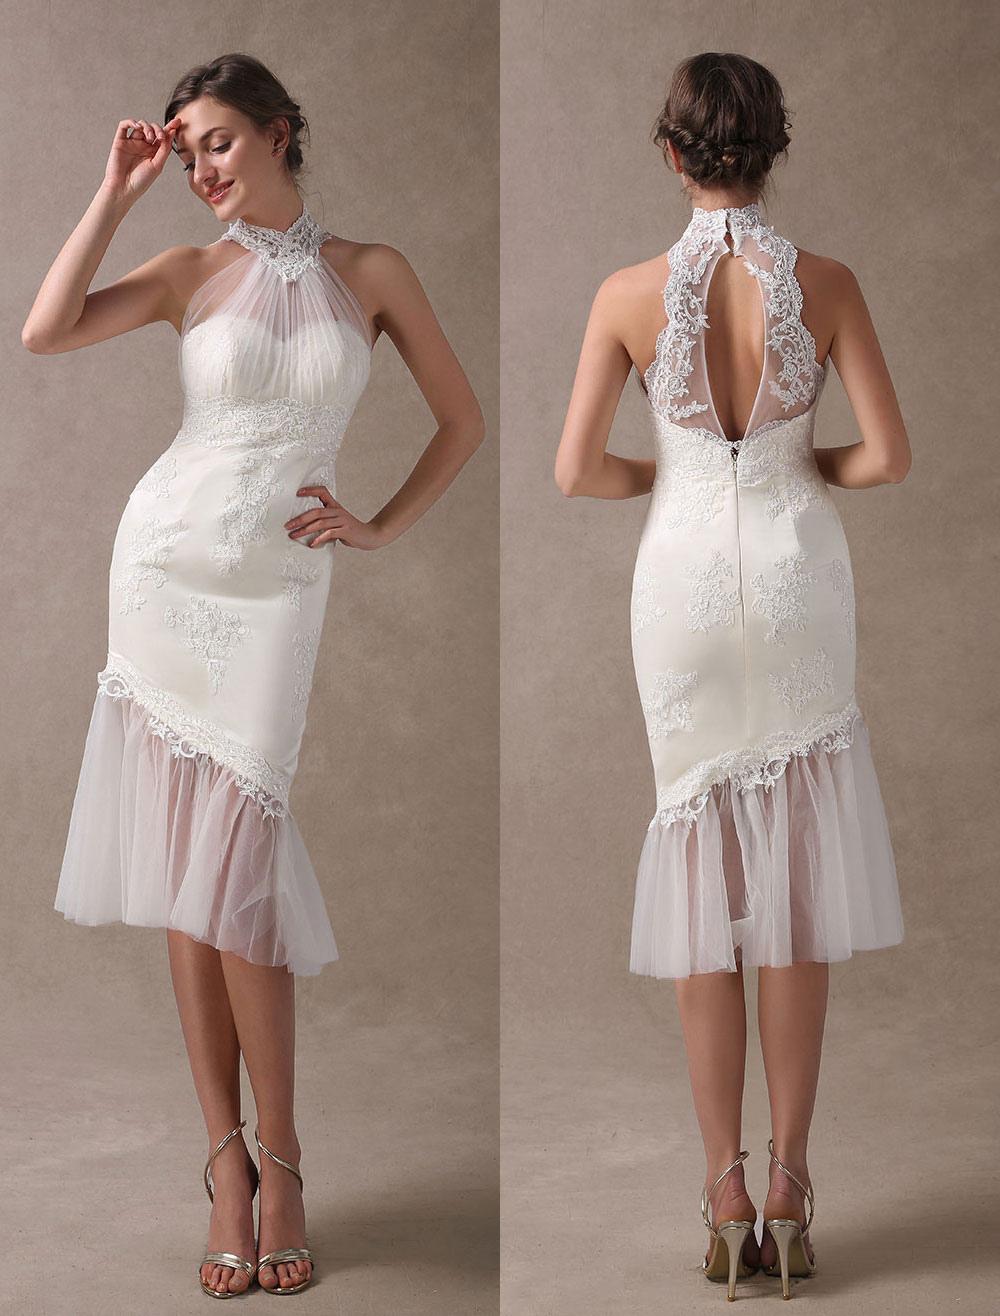 Beach Wedding Dresses Short Mermaid Bridal Dress Halter Open Back Lace Pleated Knee Length Wedding Gowns For Summer